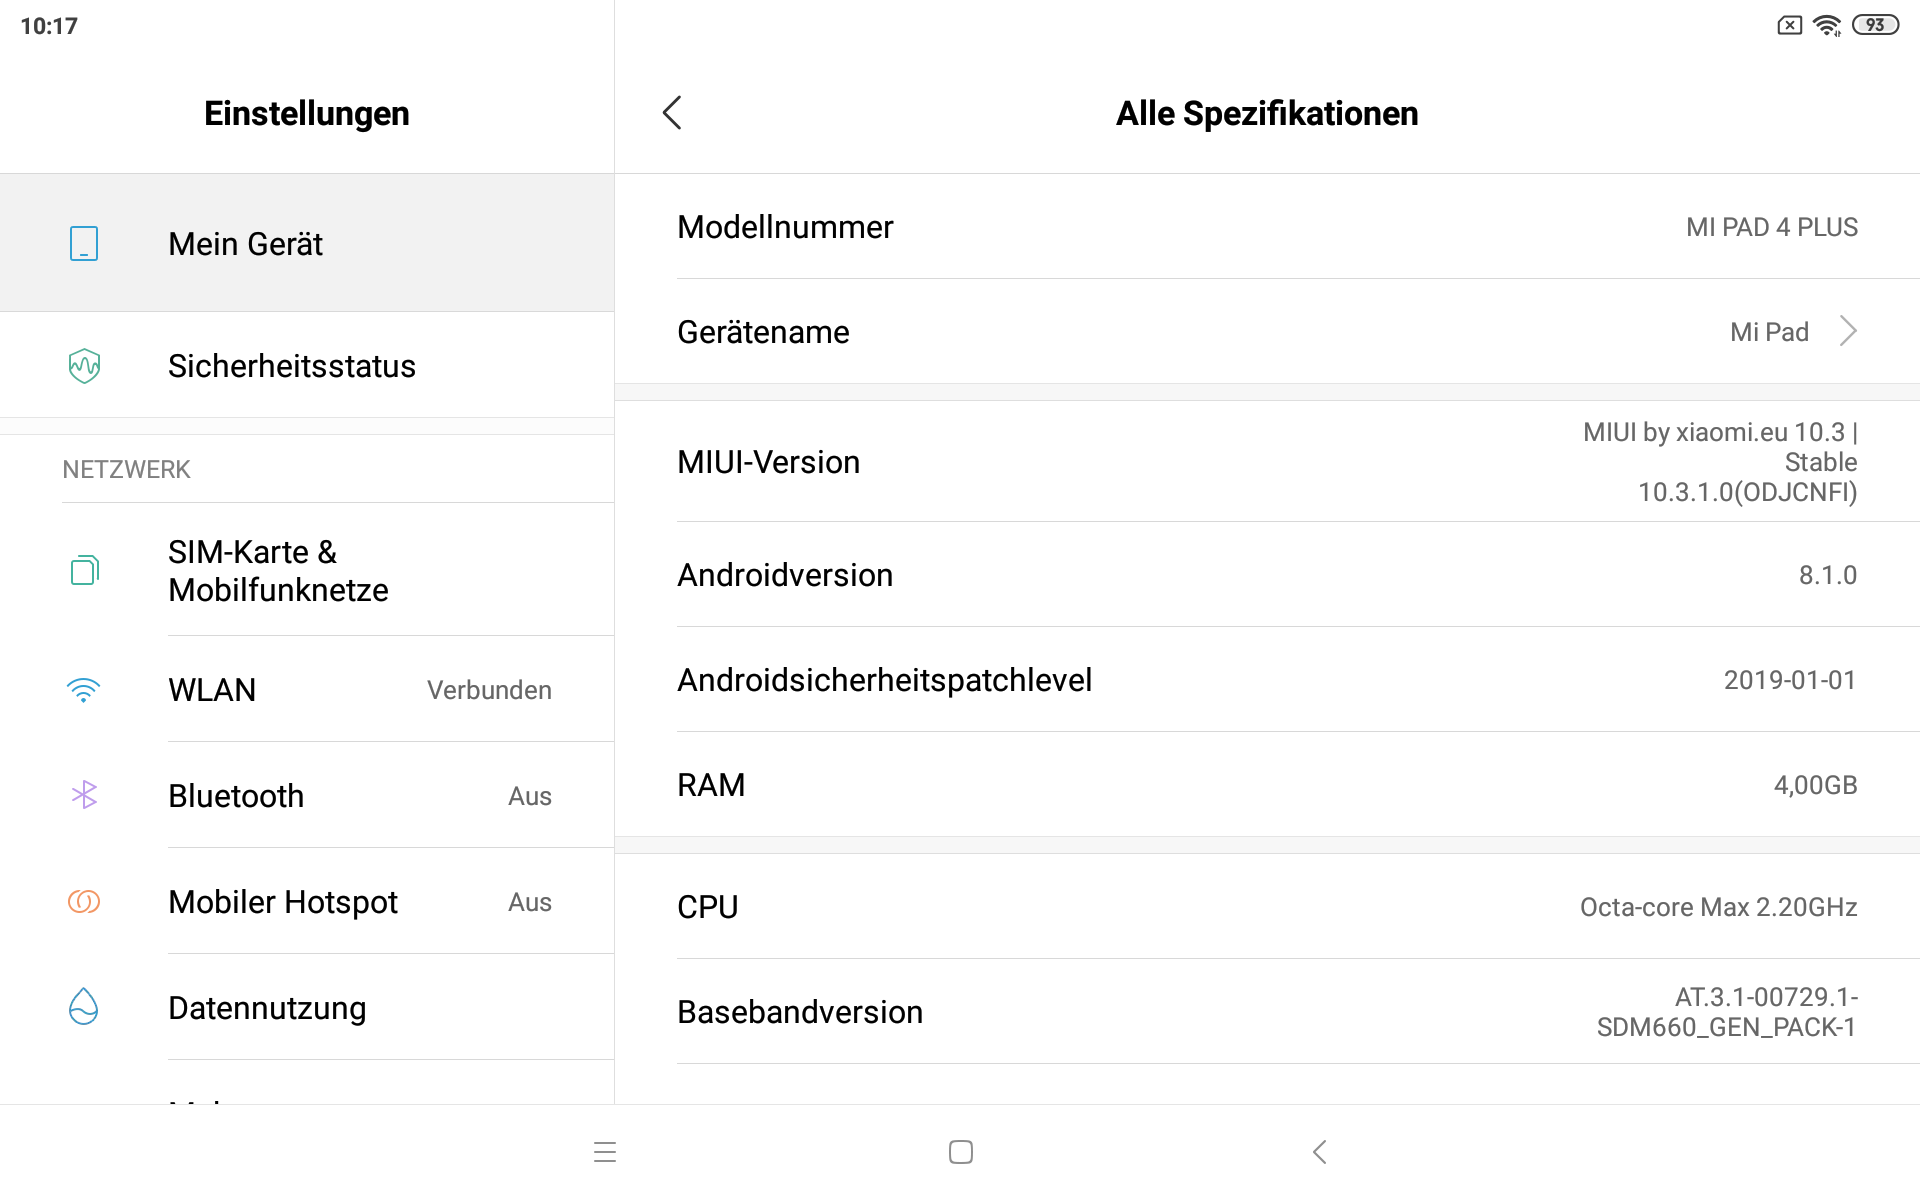 Screenshot_2019-10-09-10-17-49-274_com.android.settings.png